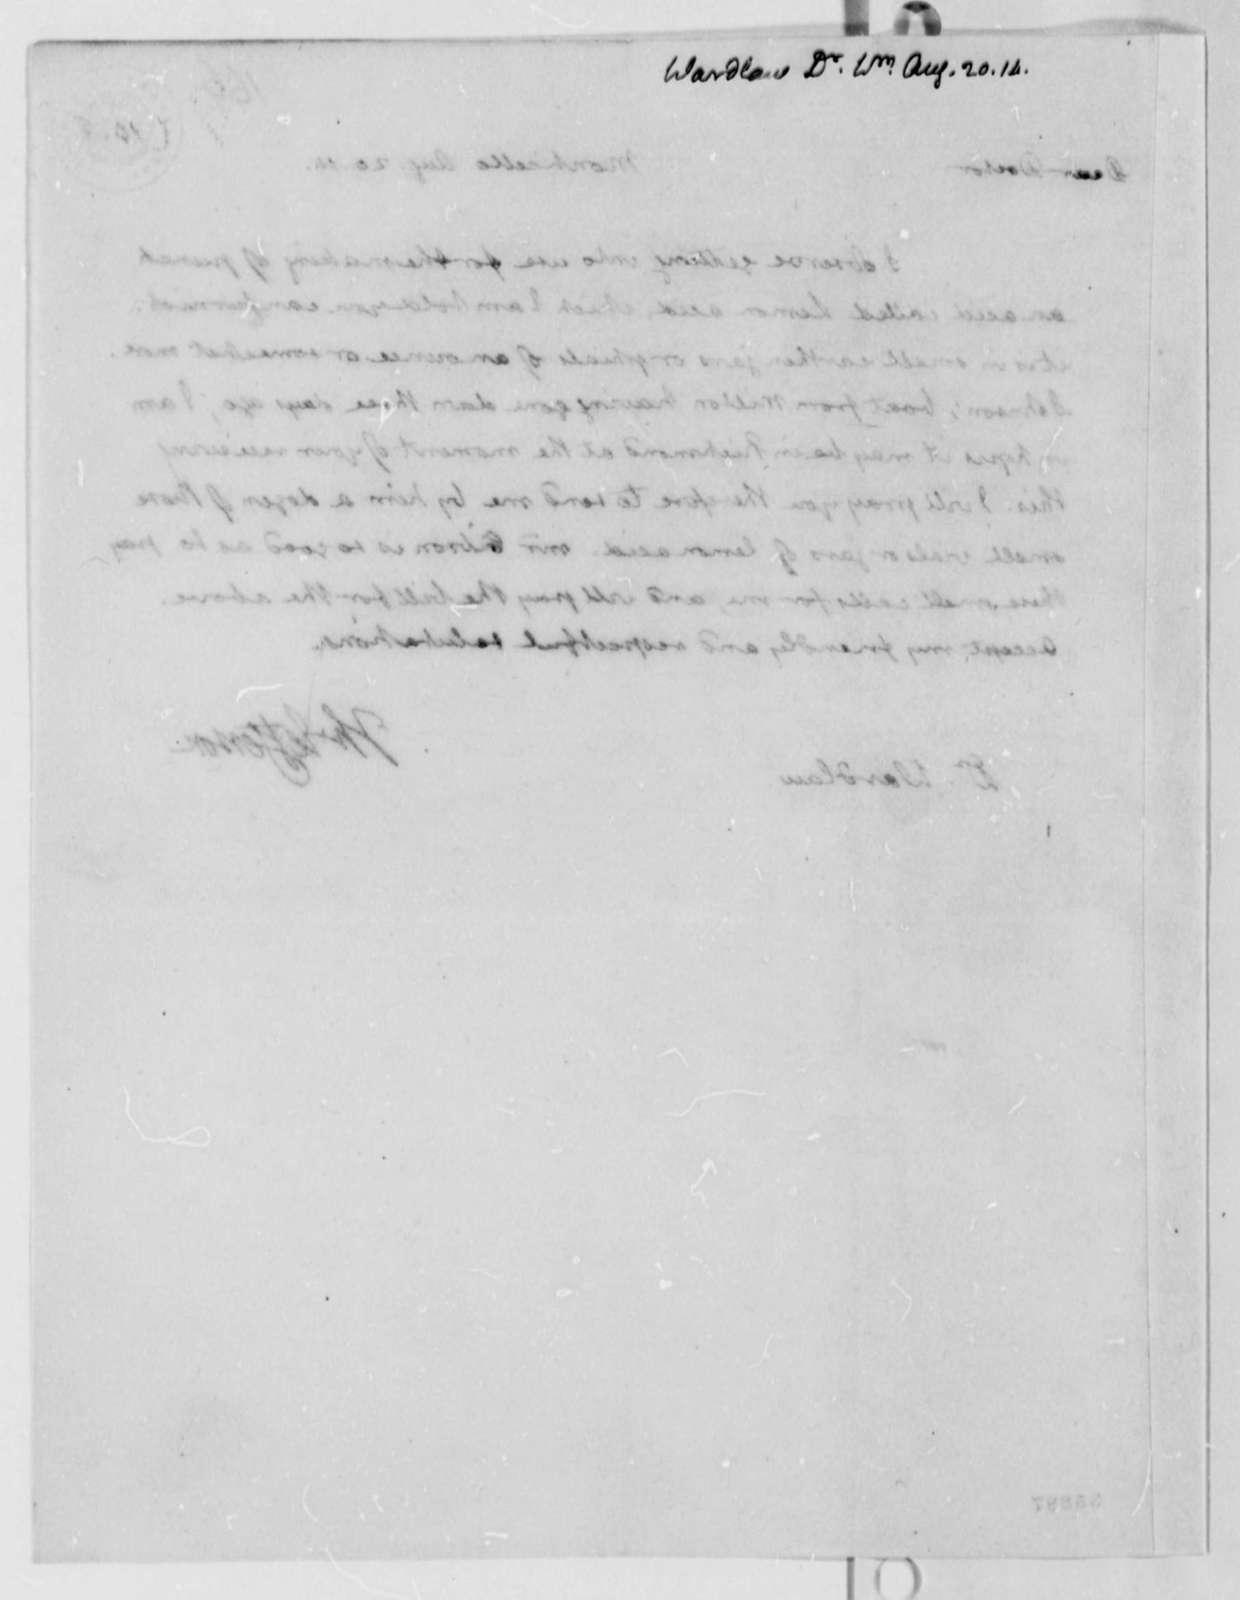 Thomas Jefferson to William Wardlaw, August 20, 1814